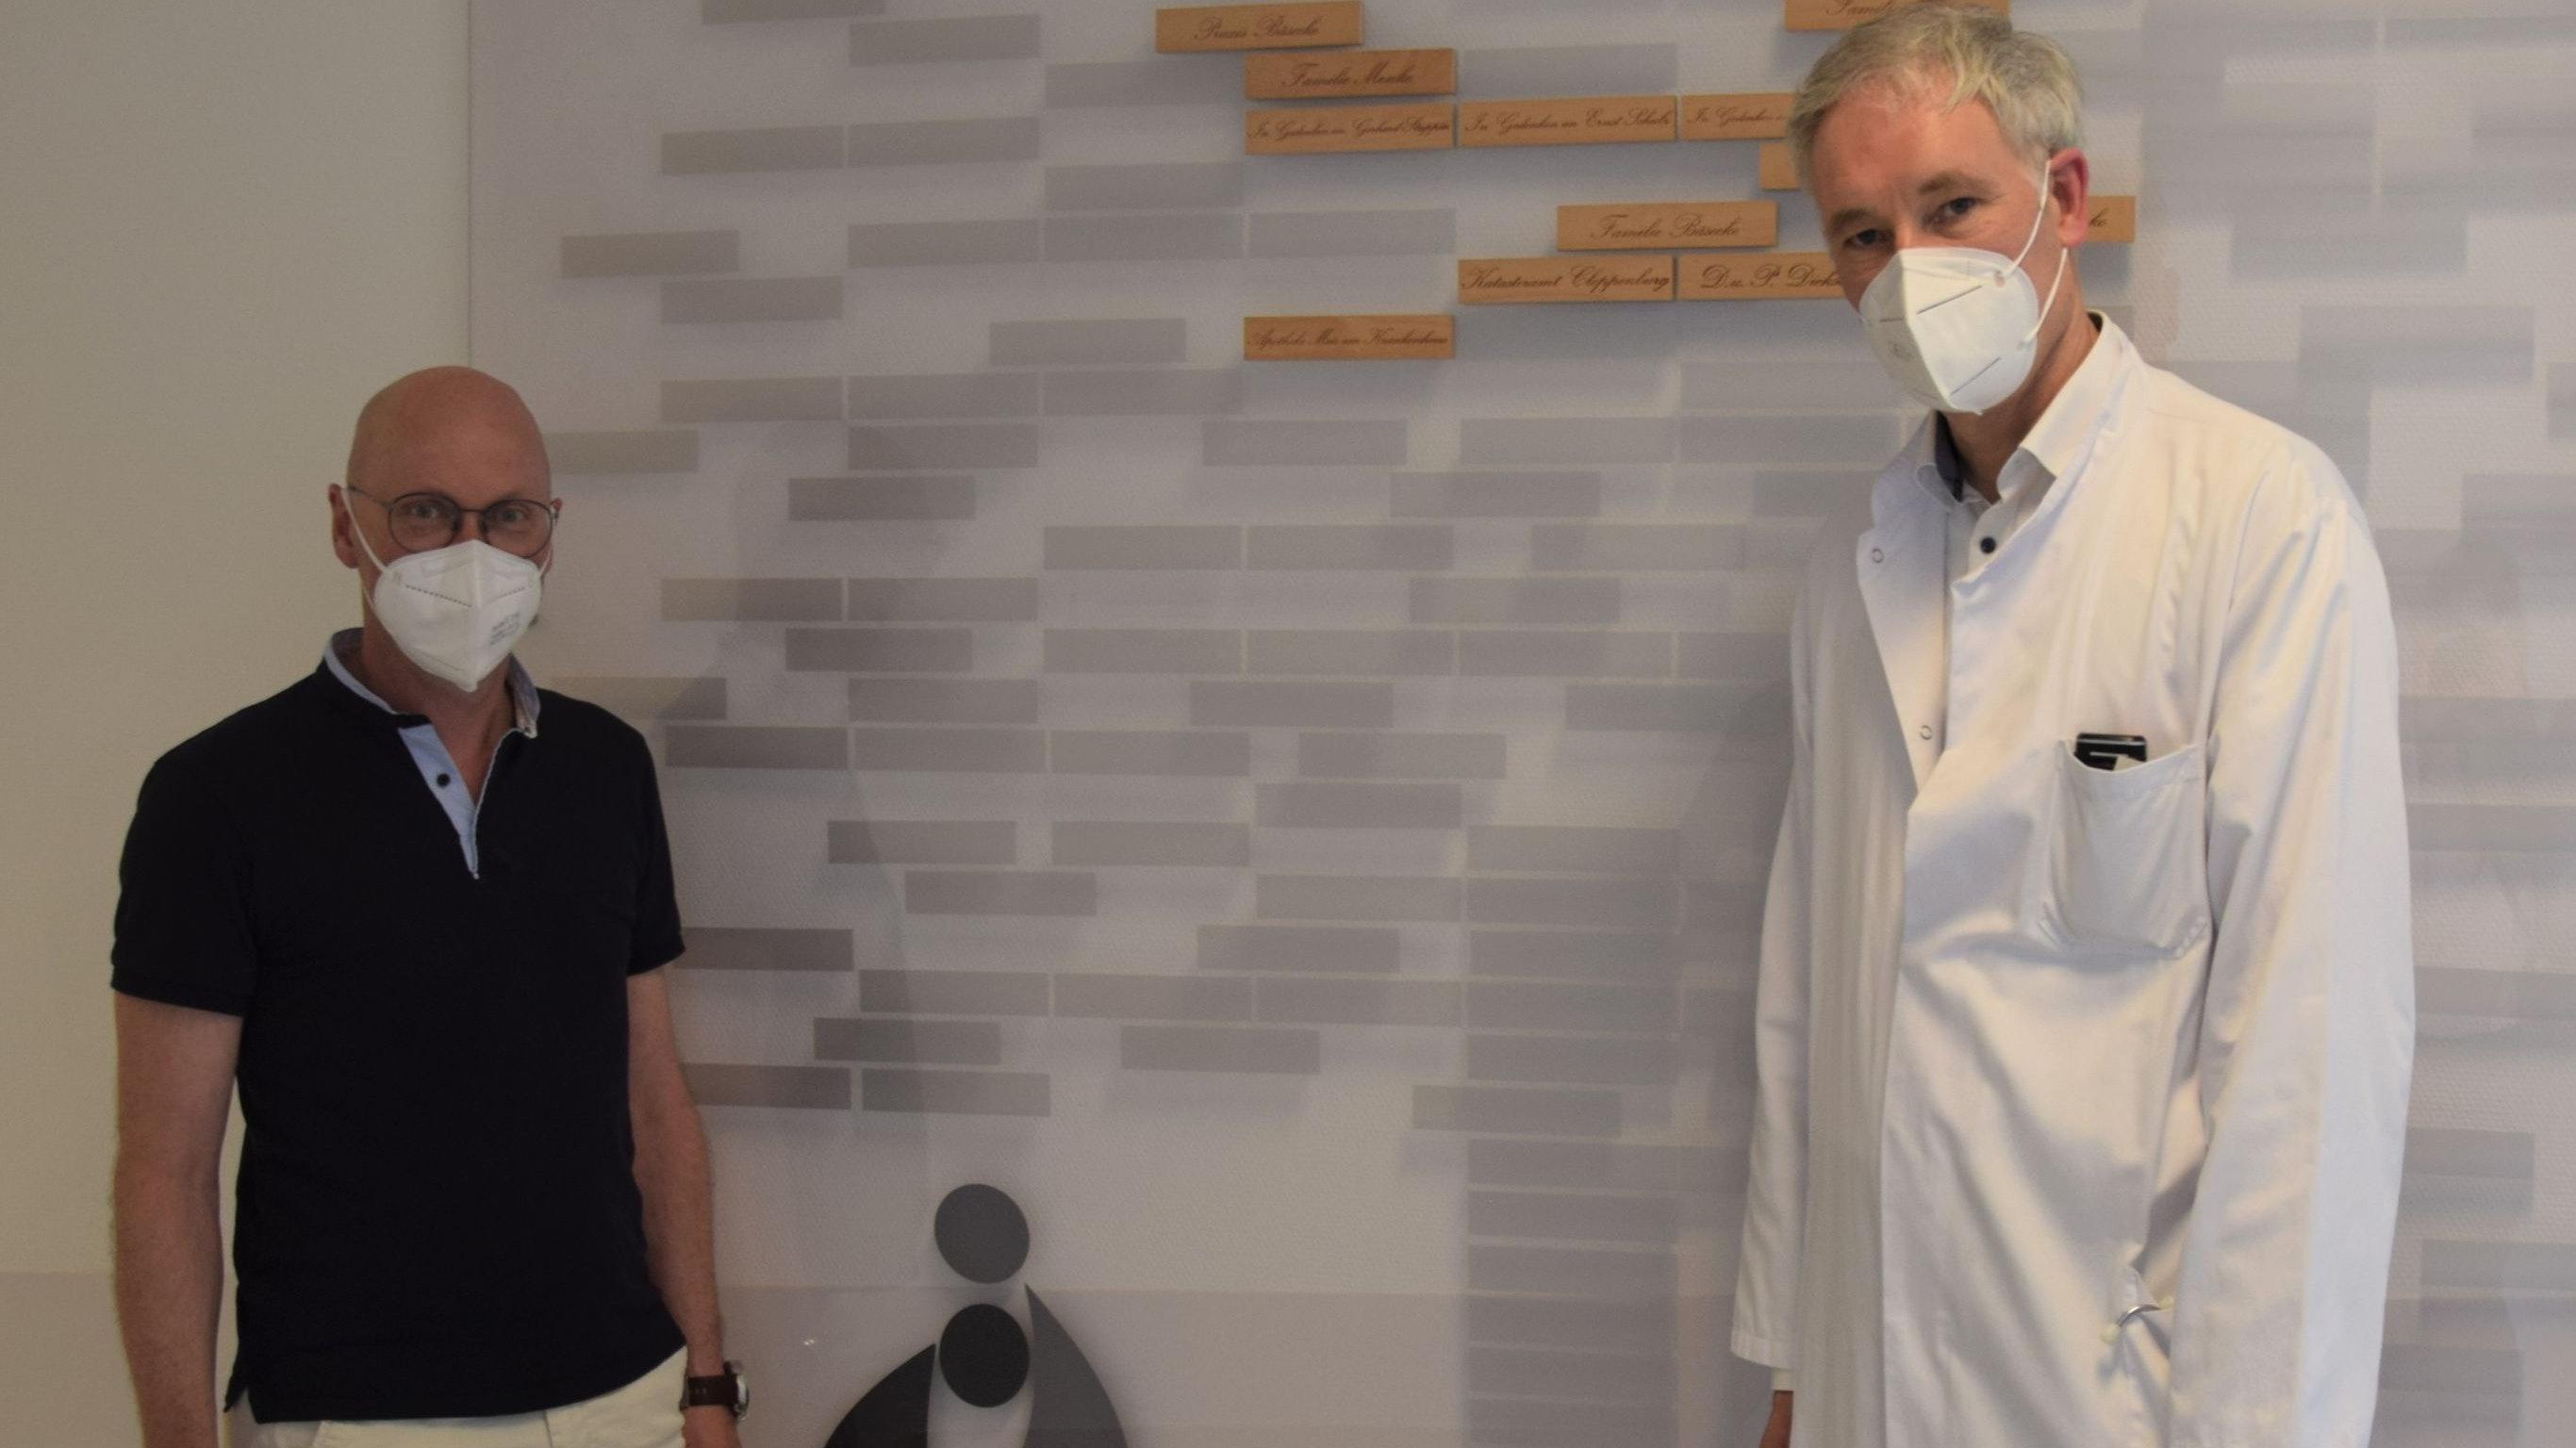 CDU-Bürgermeisterkandidat Neidhard Varnhorn (von links) und Chefarzt Dr. med. Jörg Bäsecke präsentieren den Palliativ-Spendenbaum. Foto: Hahn